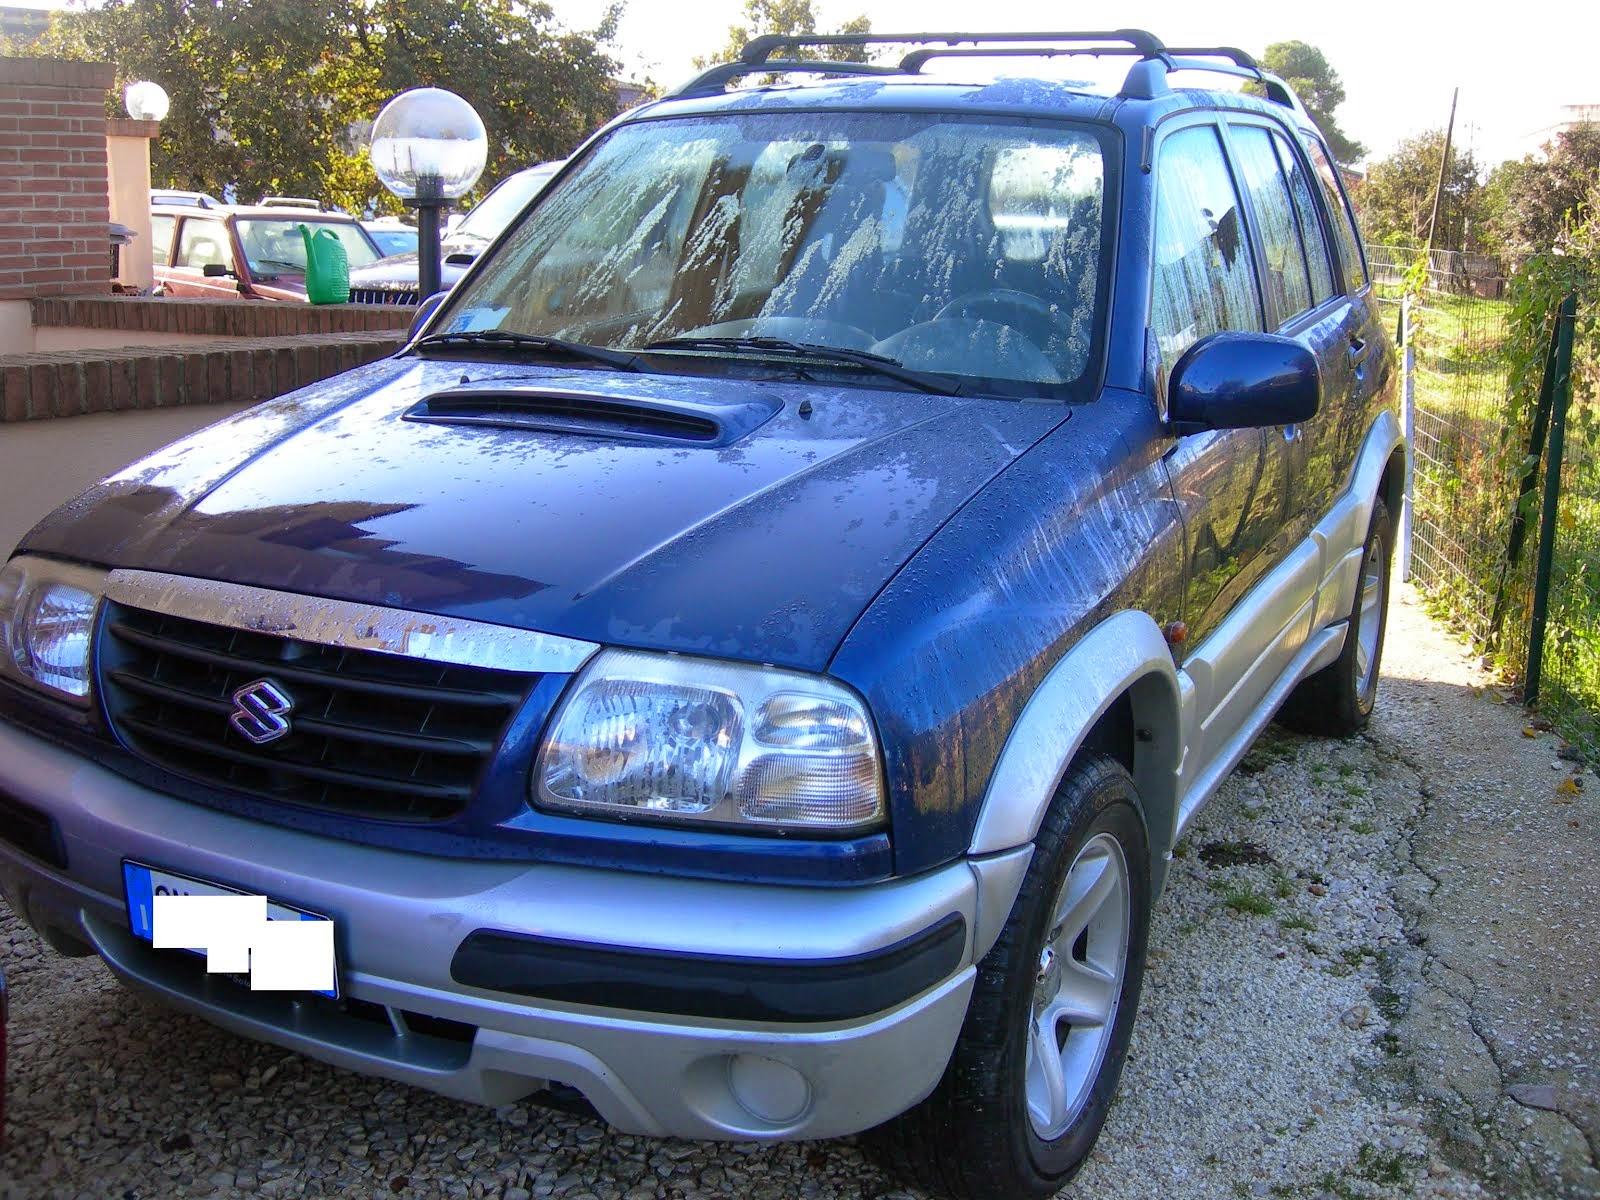 Suzuki Gran Vitara 2.0 TDI 4x4 acc: full optional 100.000 km  Anno 2004 prezzo 6.000,00 Euro